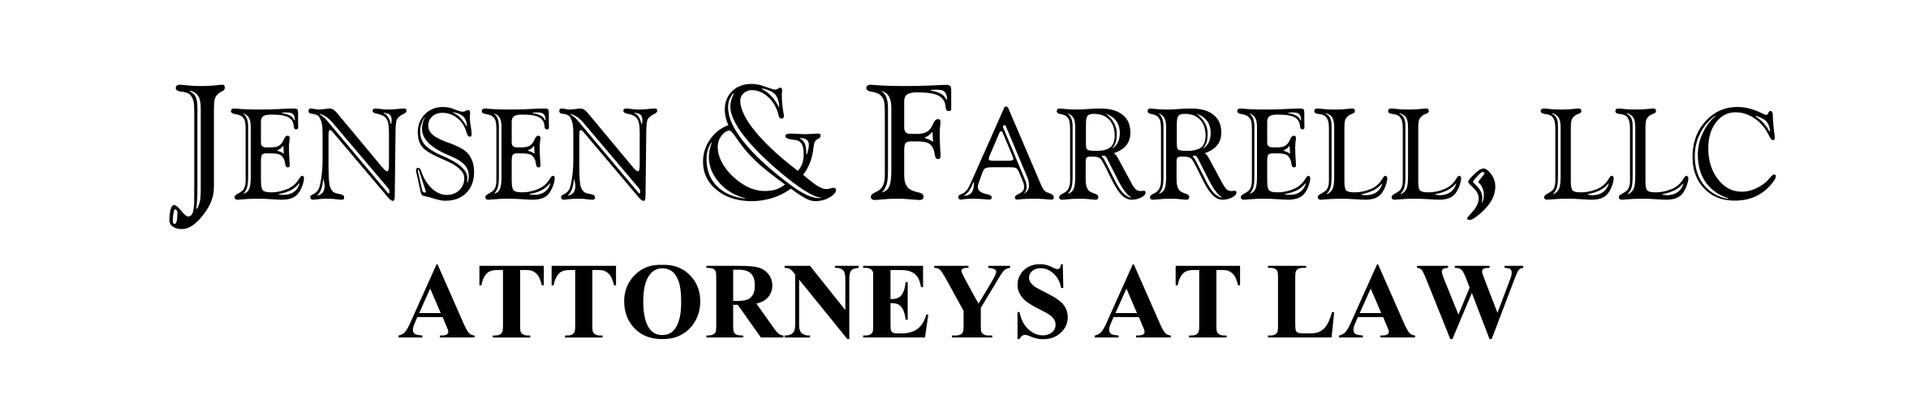 Jensen & Farrell, LLC